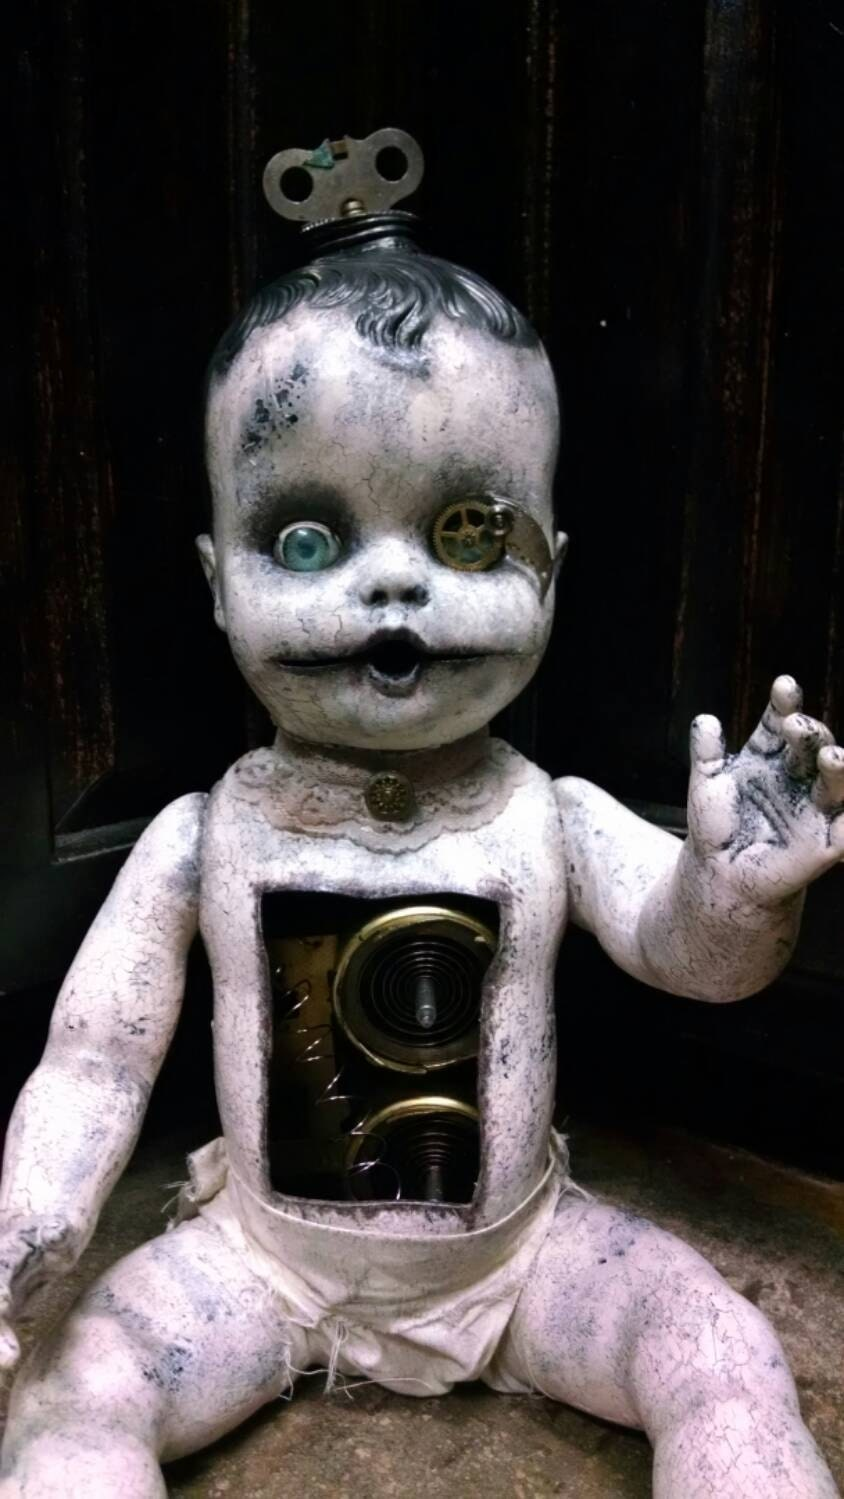 Tick Tock Creepy Steampunk Doll